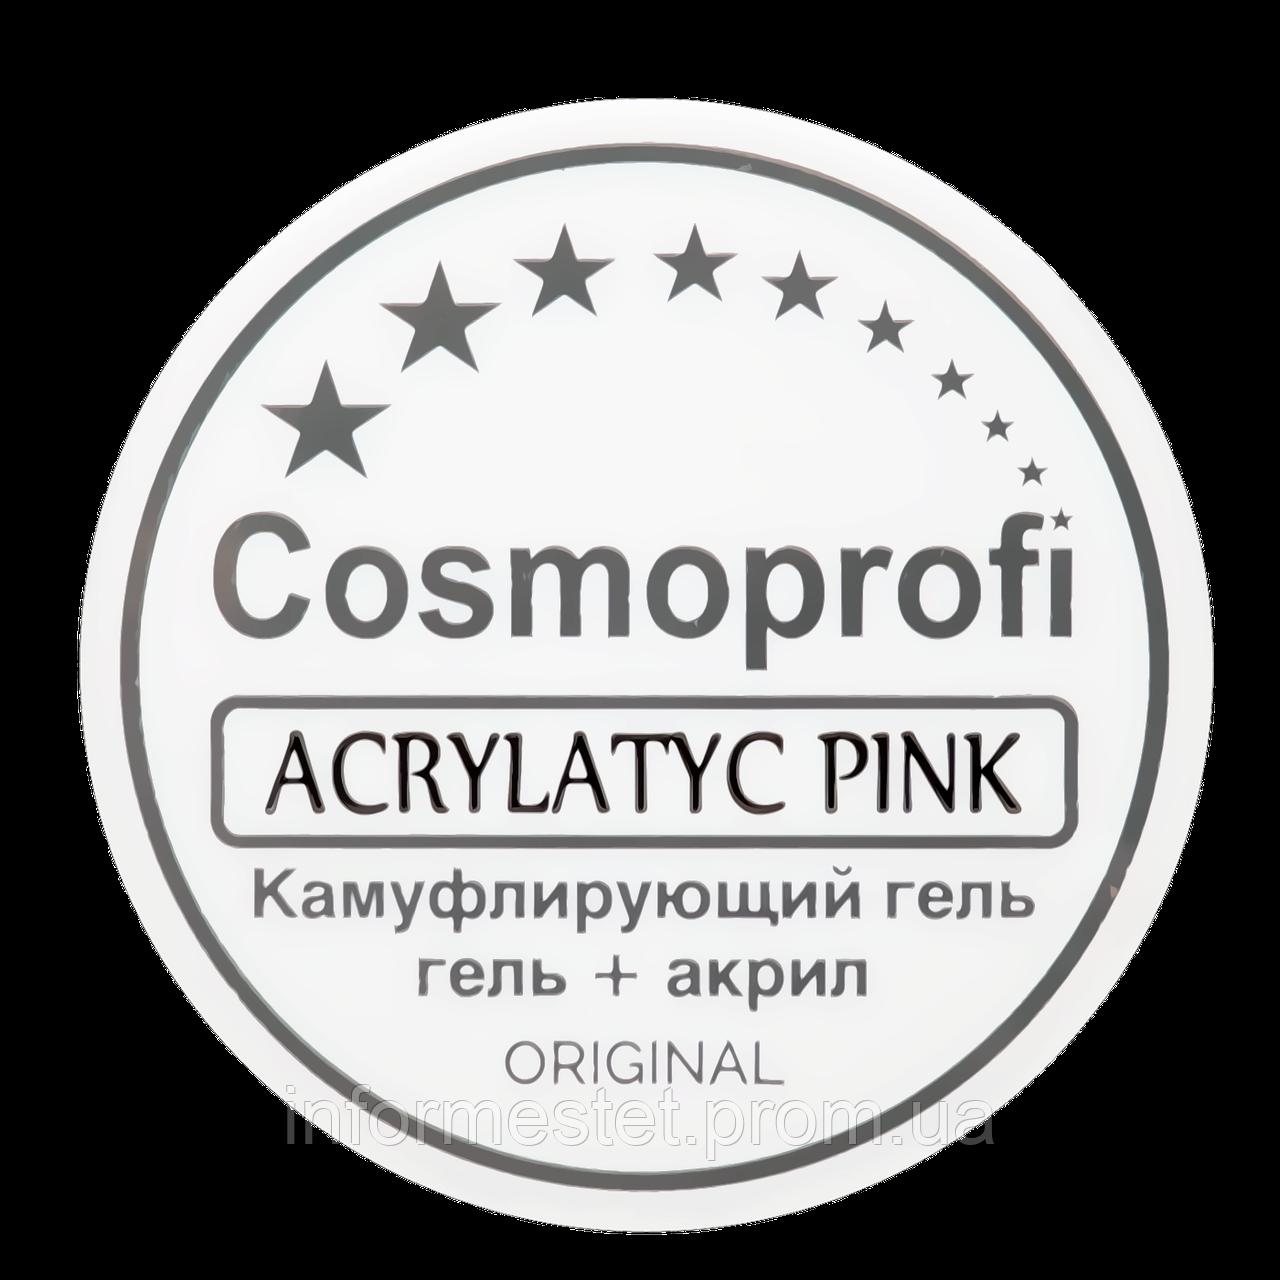 Acrylatic  Pink 15g